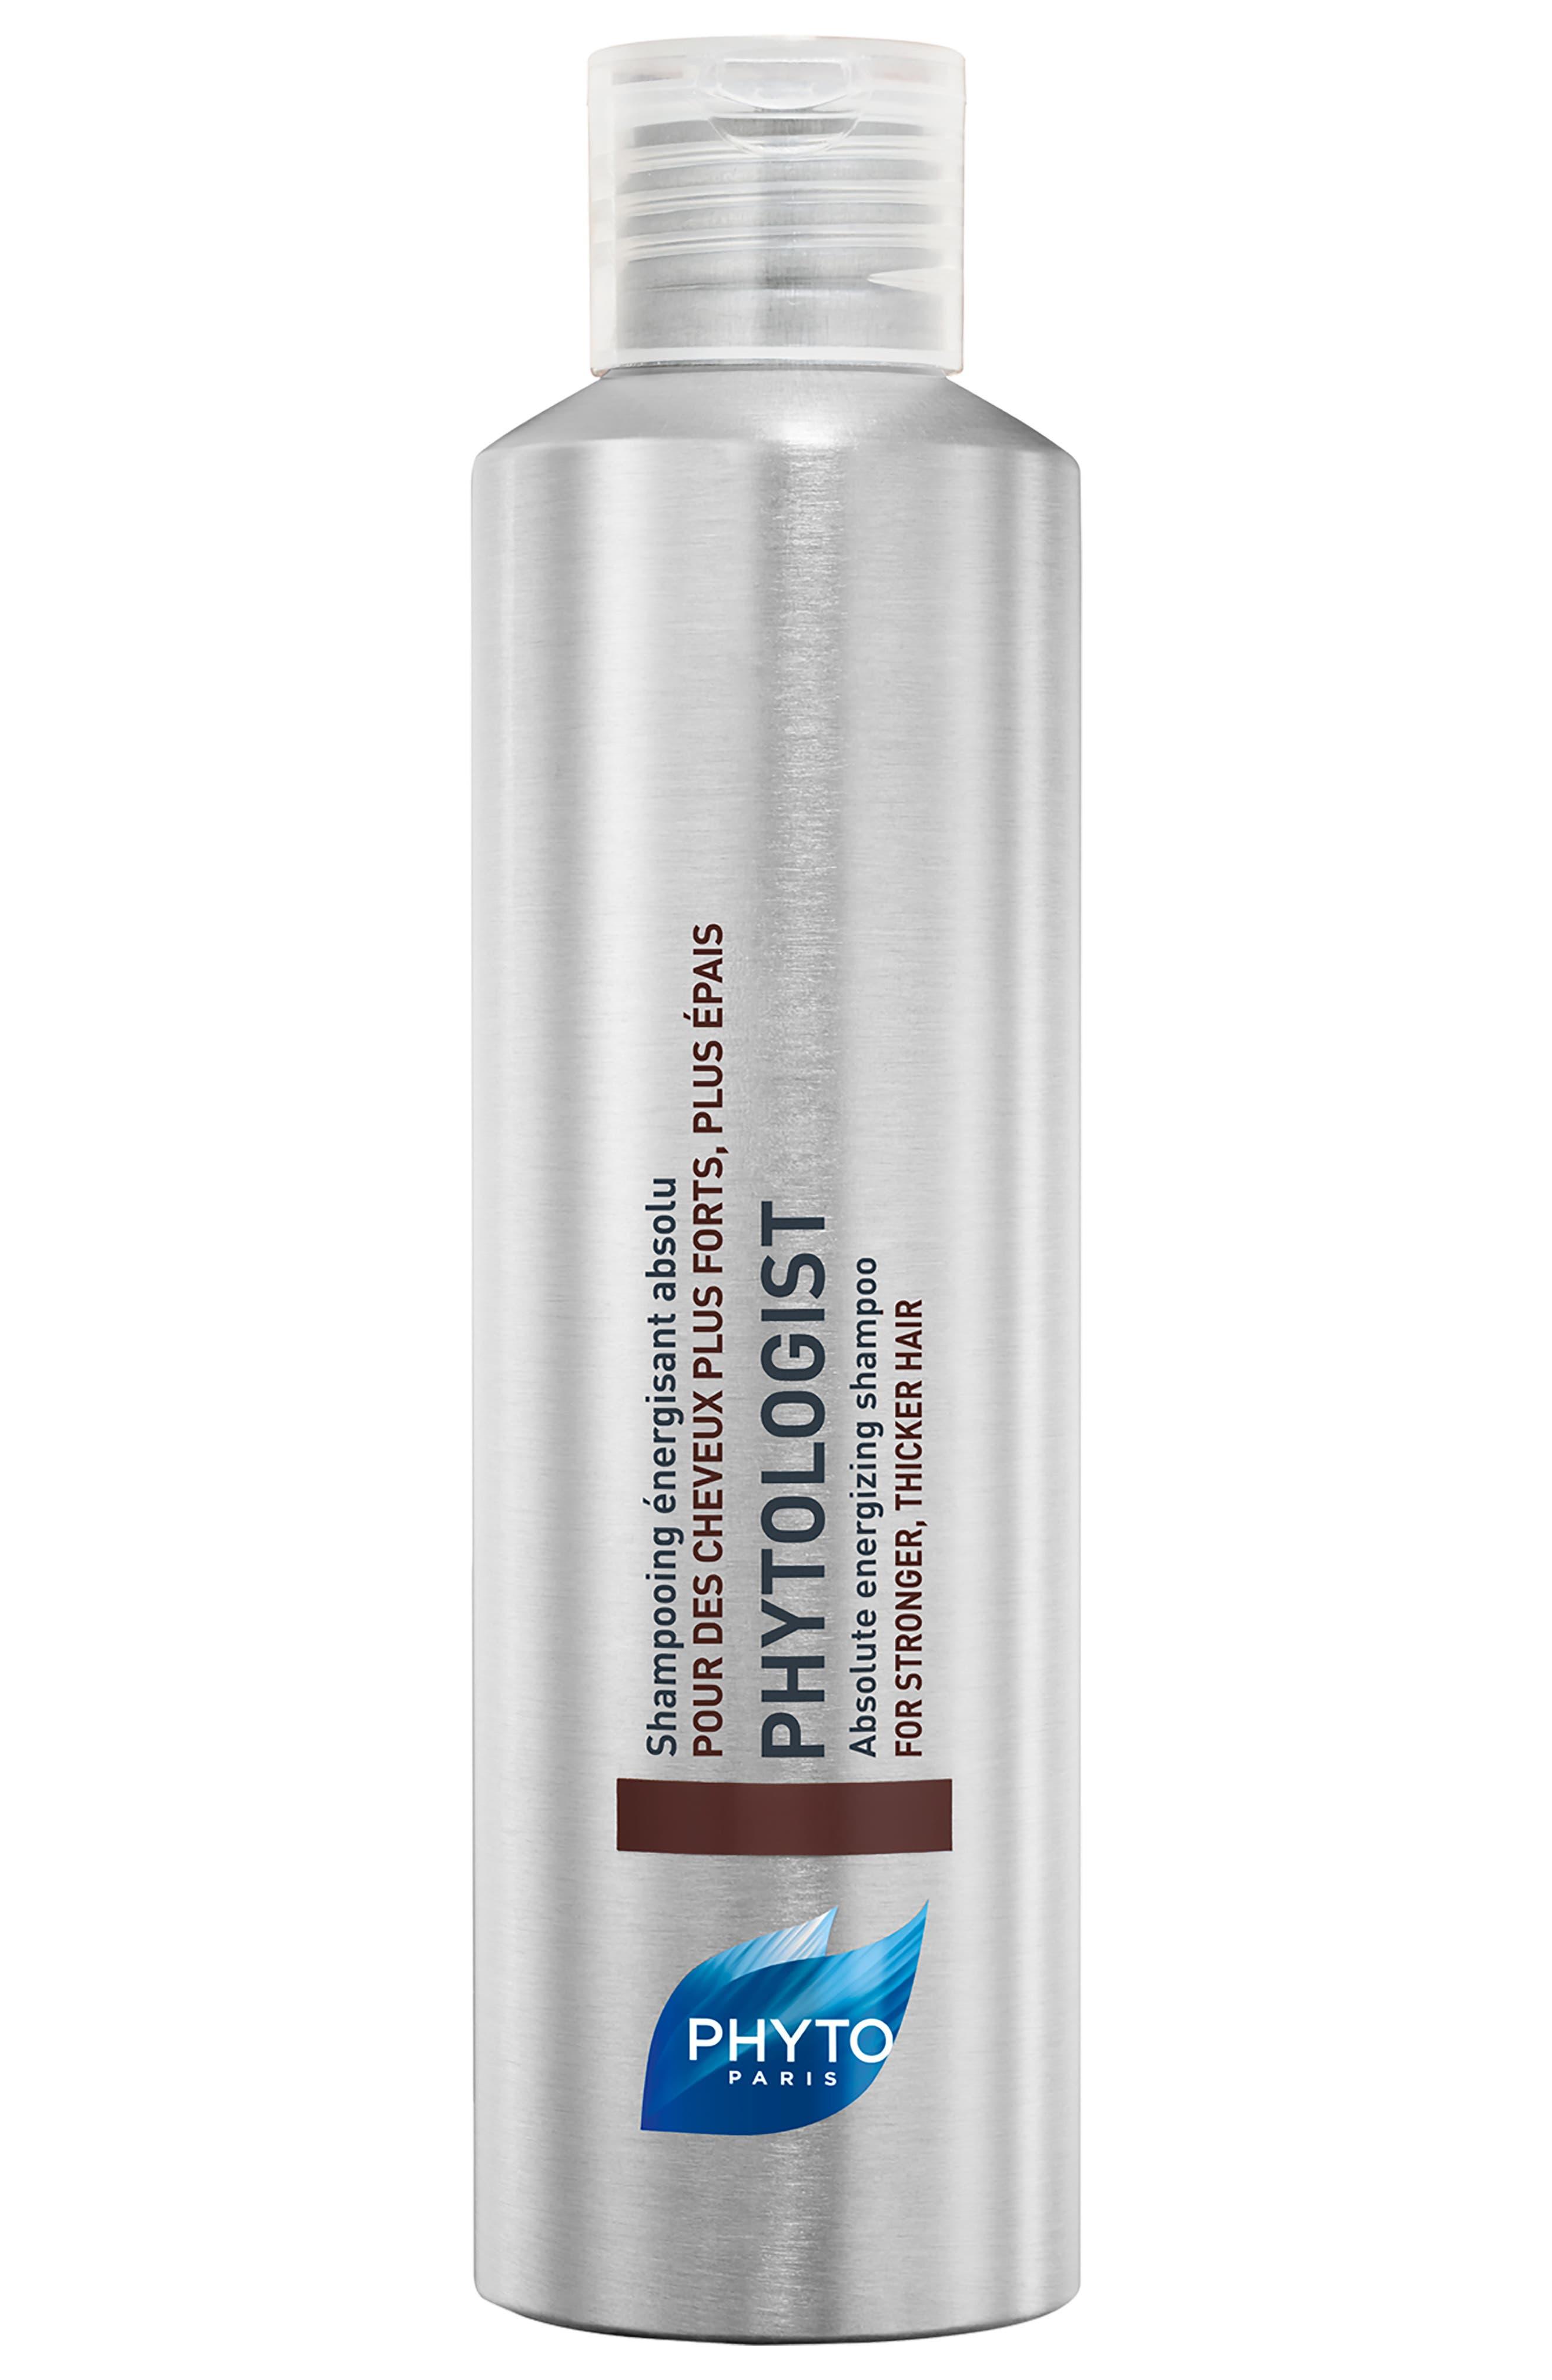 PHYTO PHYTOLOGIST Absolute Energizing Shampoo